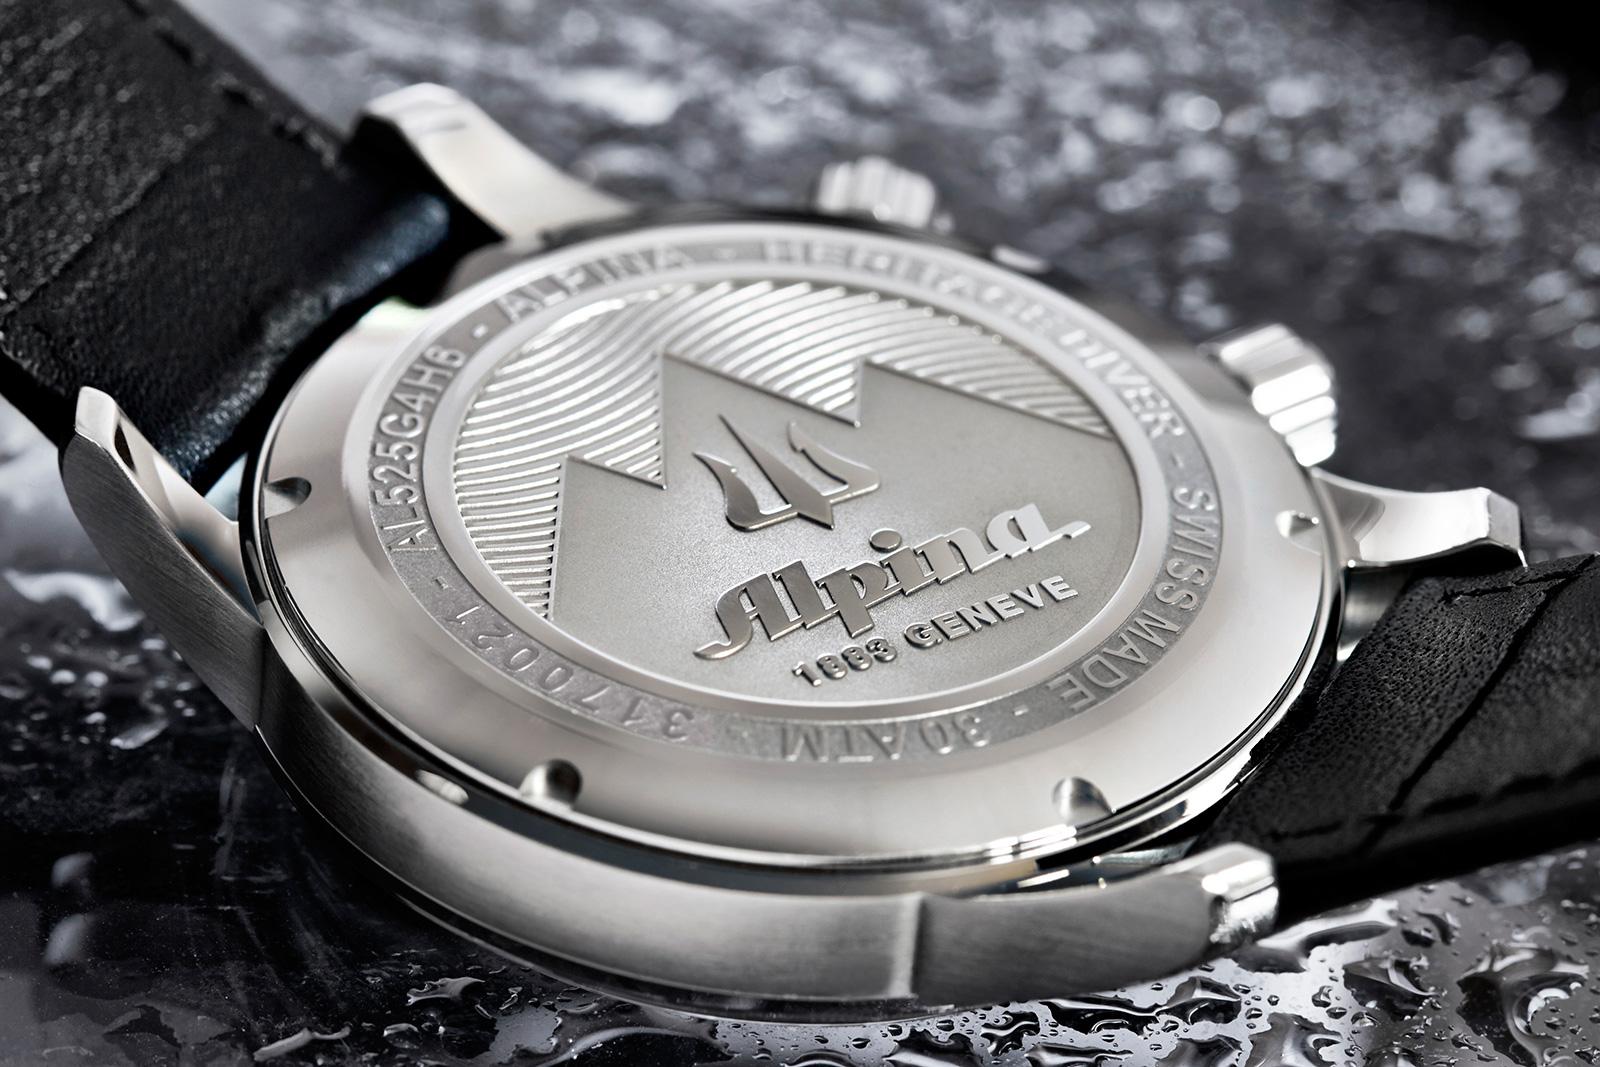 Naziv: Alpina-Seastrong-Diver-Heritage-4.jpg, pregleda: 238, veličina: 470,0 KB